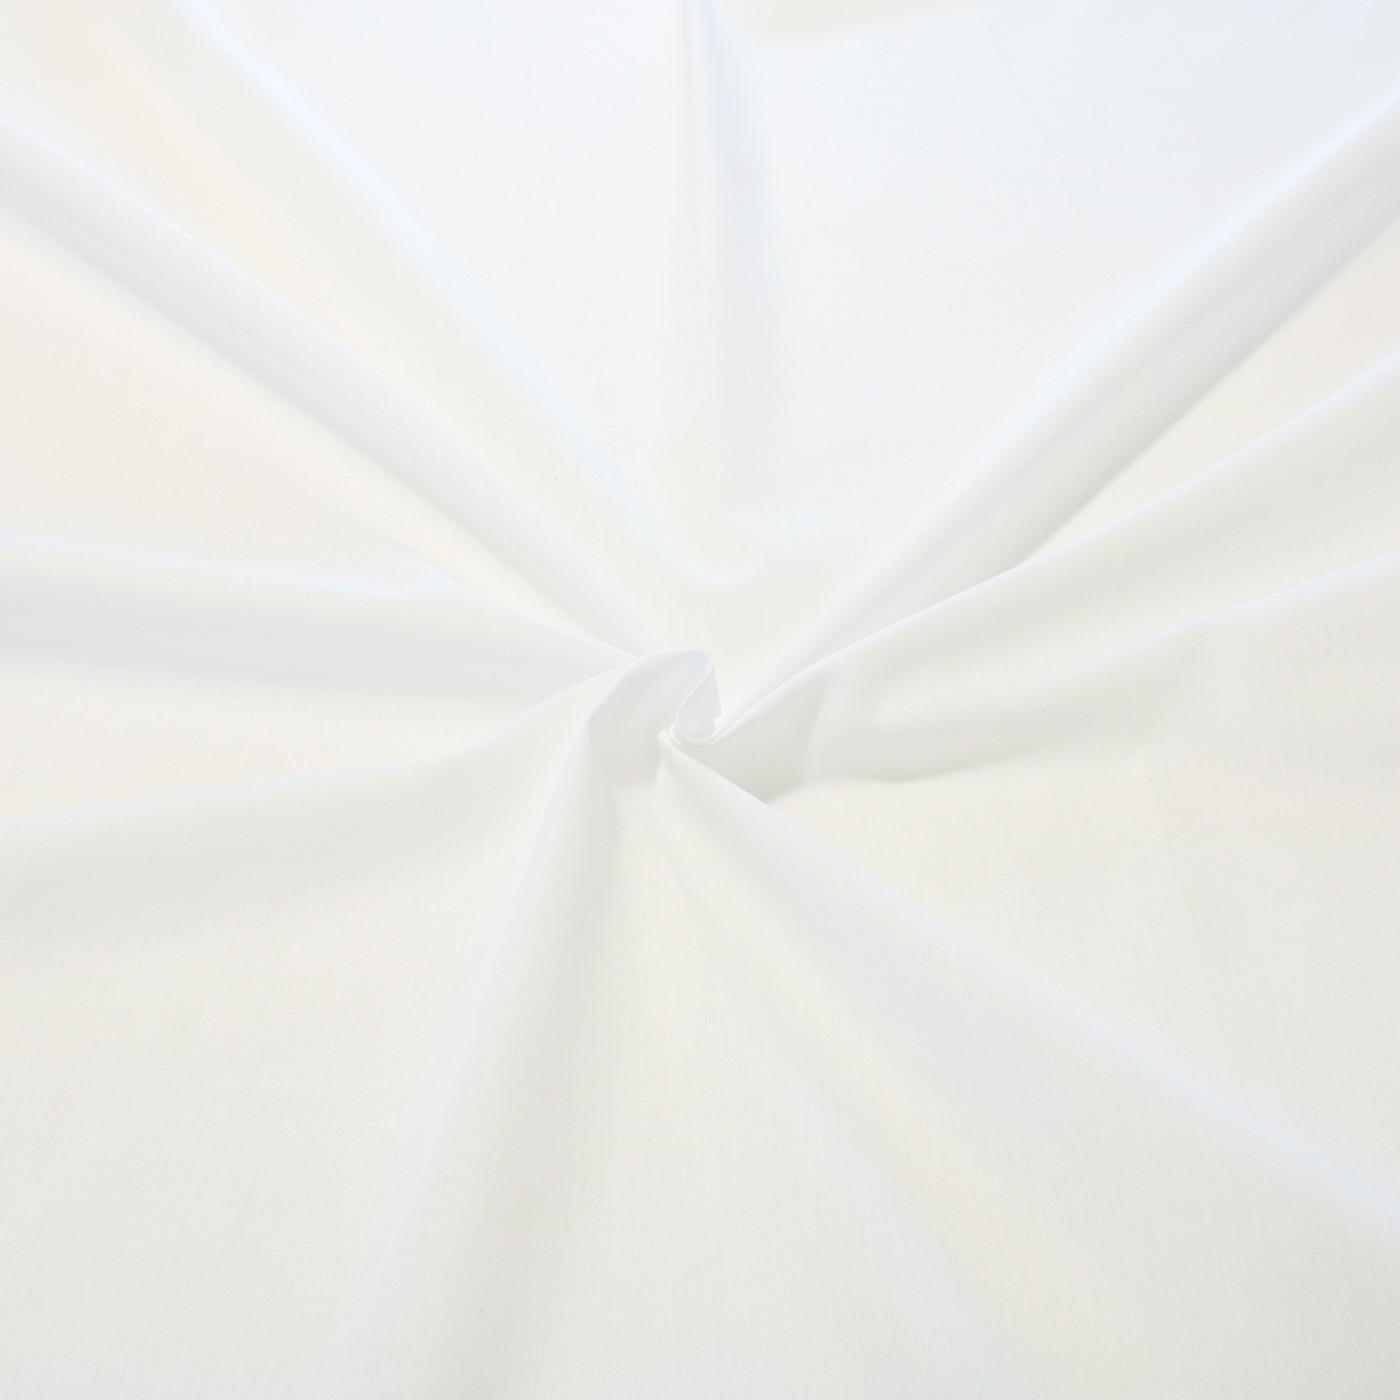 Tecido tricoline liso 50% algodão 50% poliéster branco